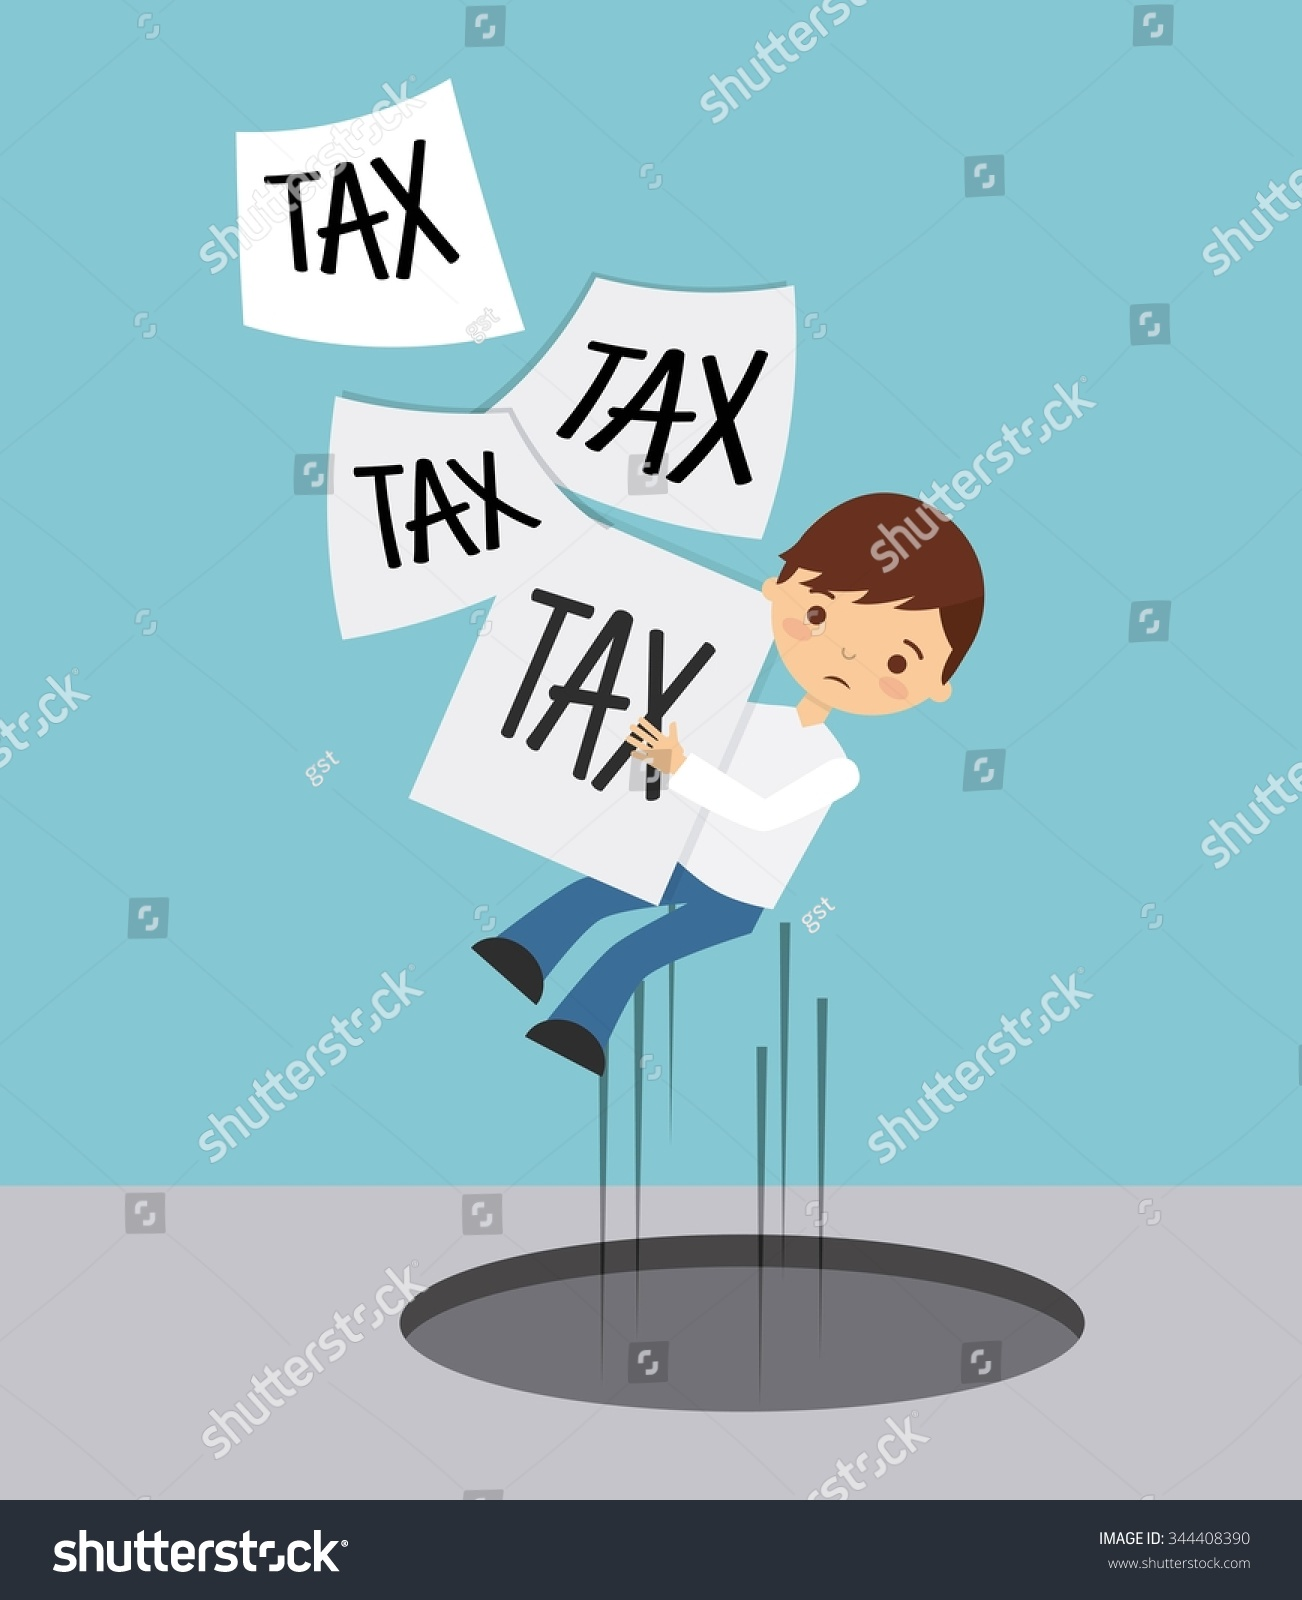 Tax Liability Design, Vector Illustration Eps10 Graphic - 344408390 : Shutterstock